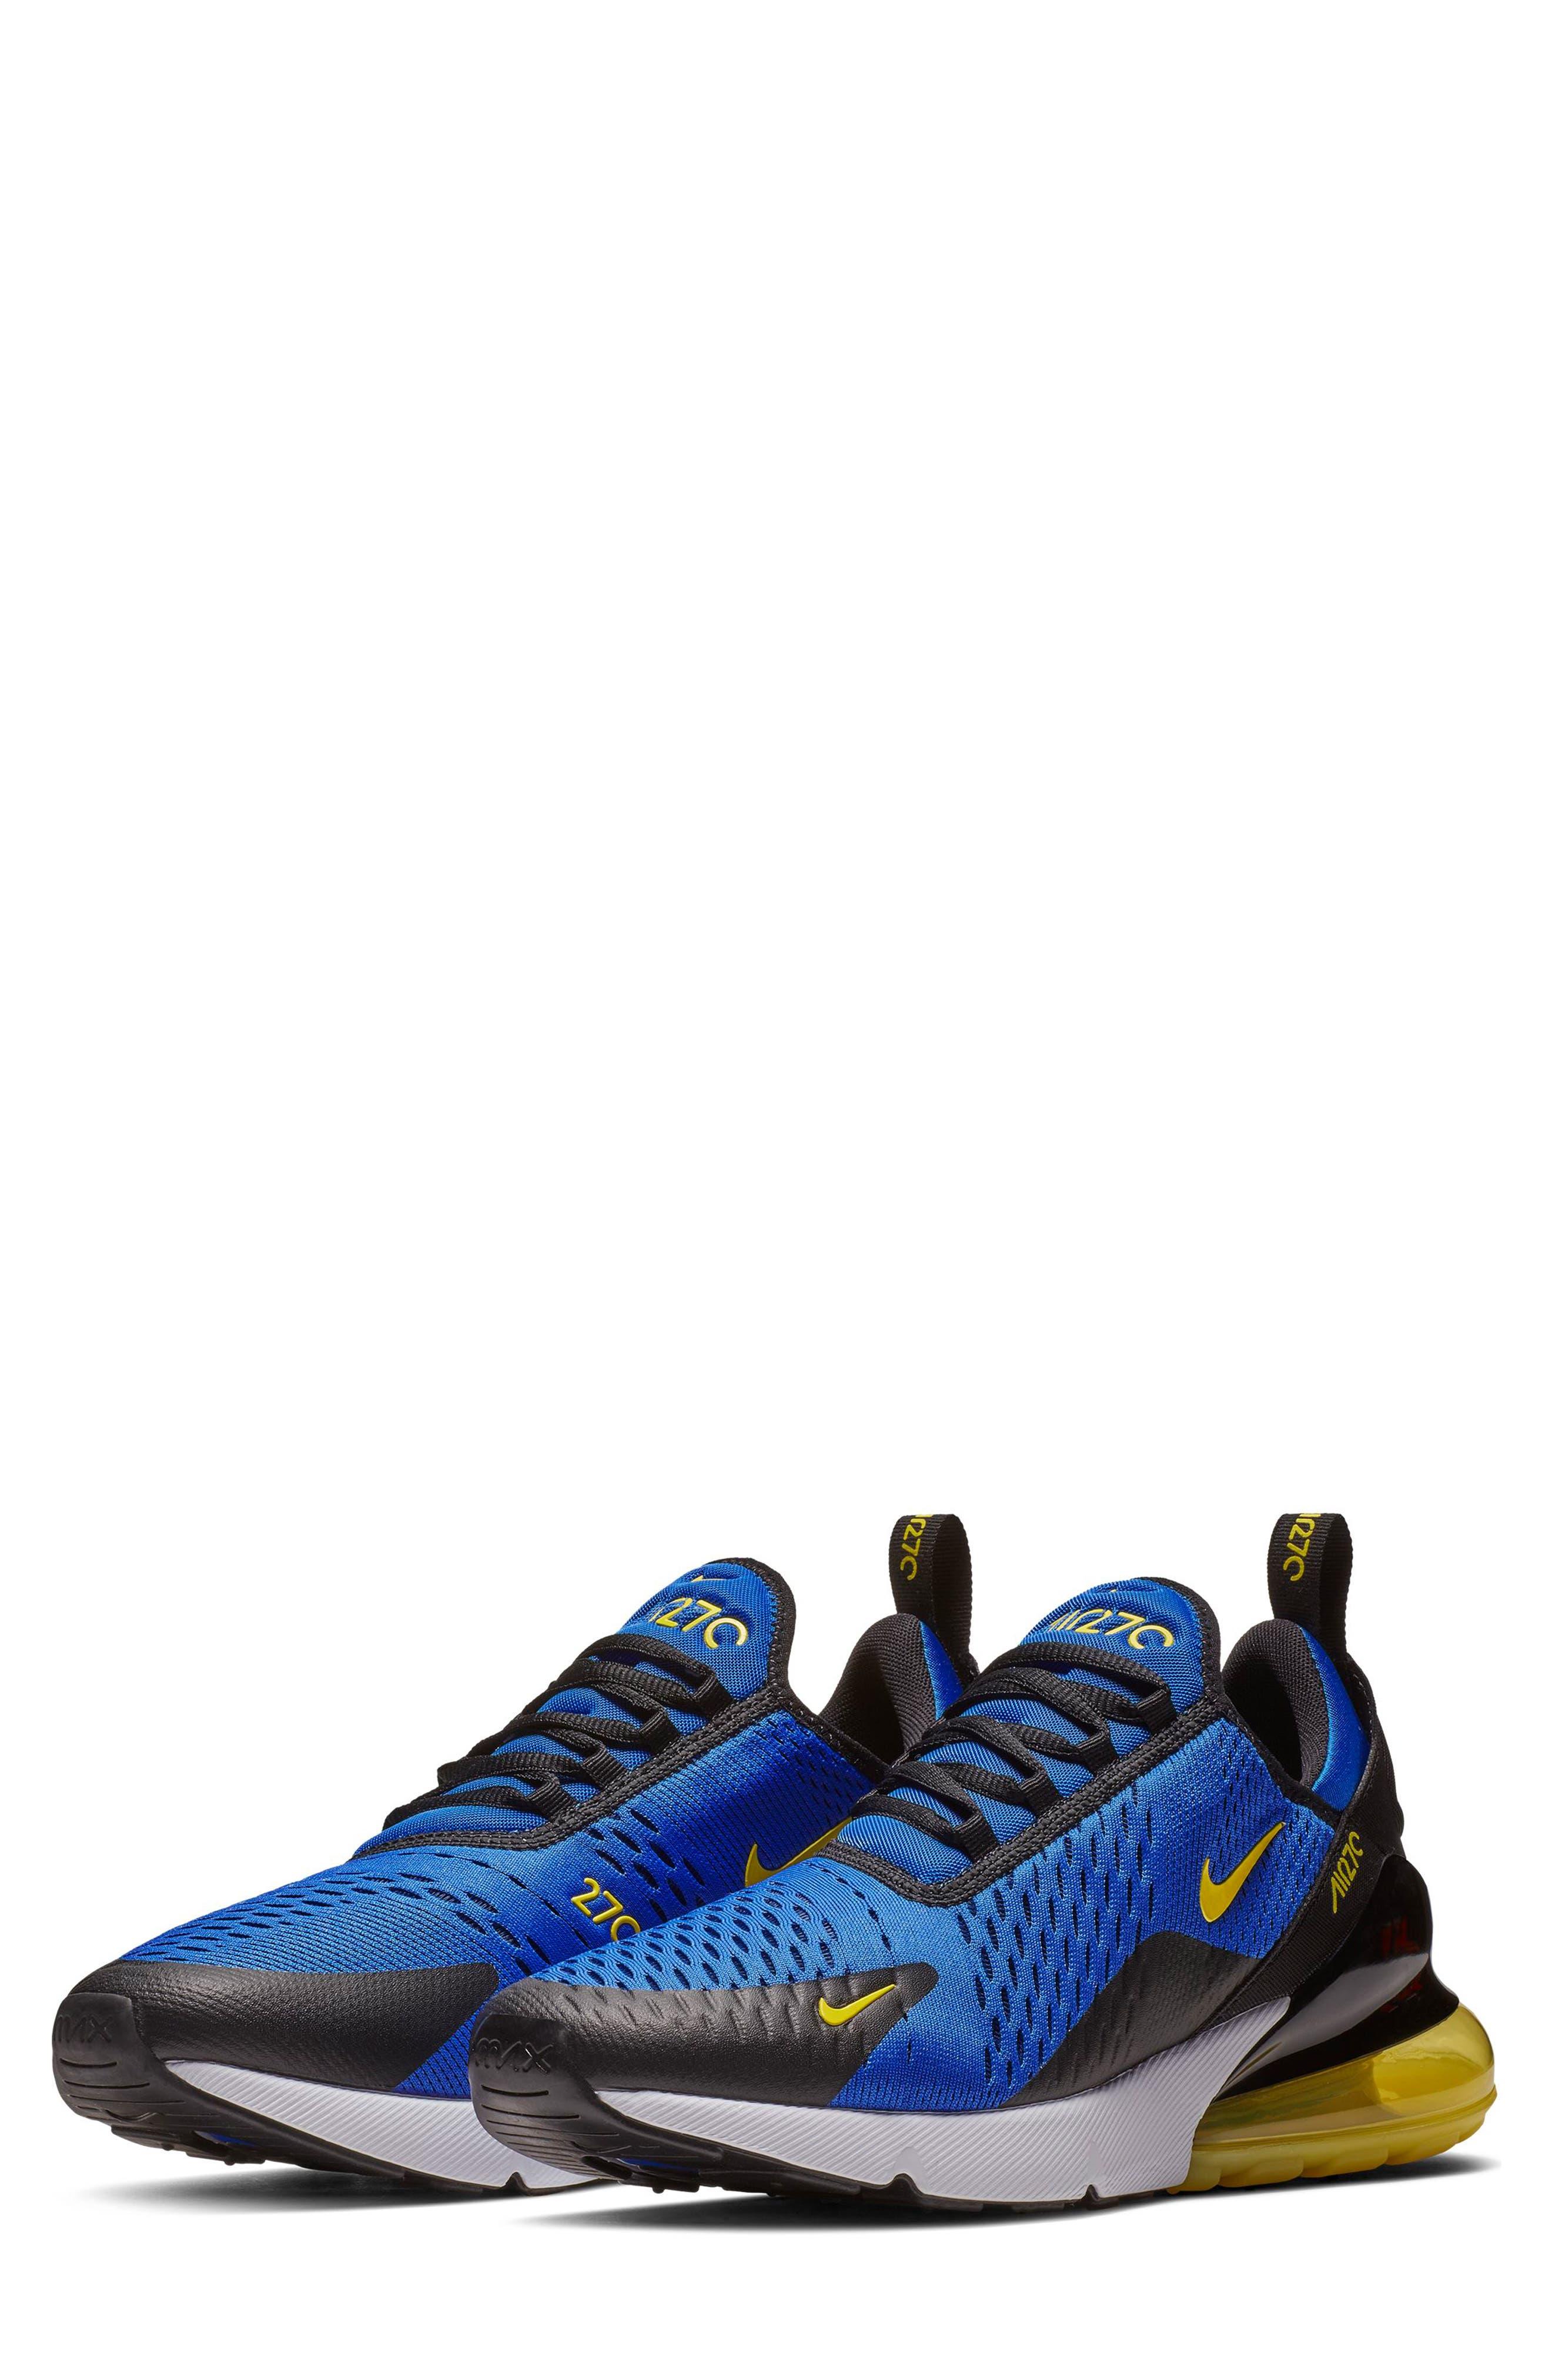 Air Max 270 Sneaker,                         Main,                         color, GAME ROYAL/ WHITE/ BLACK